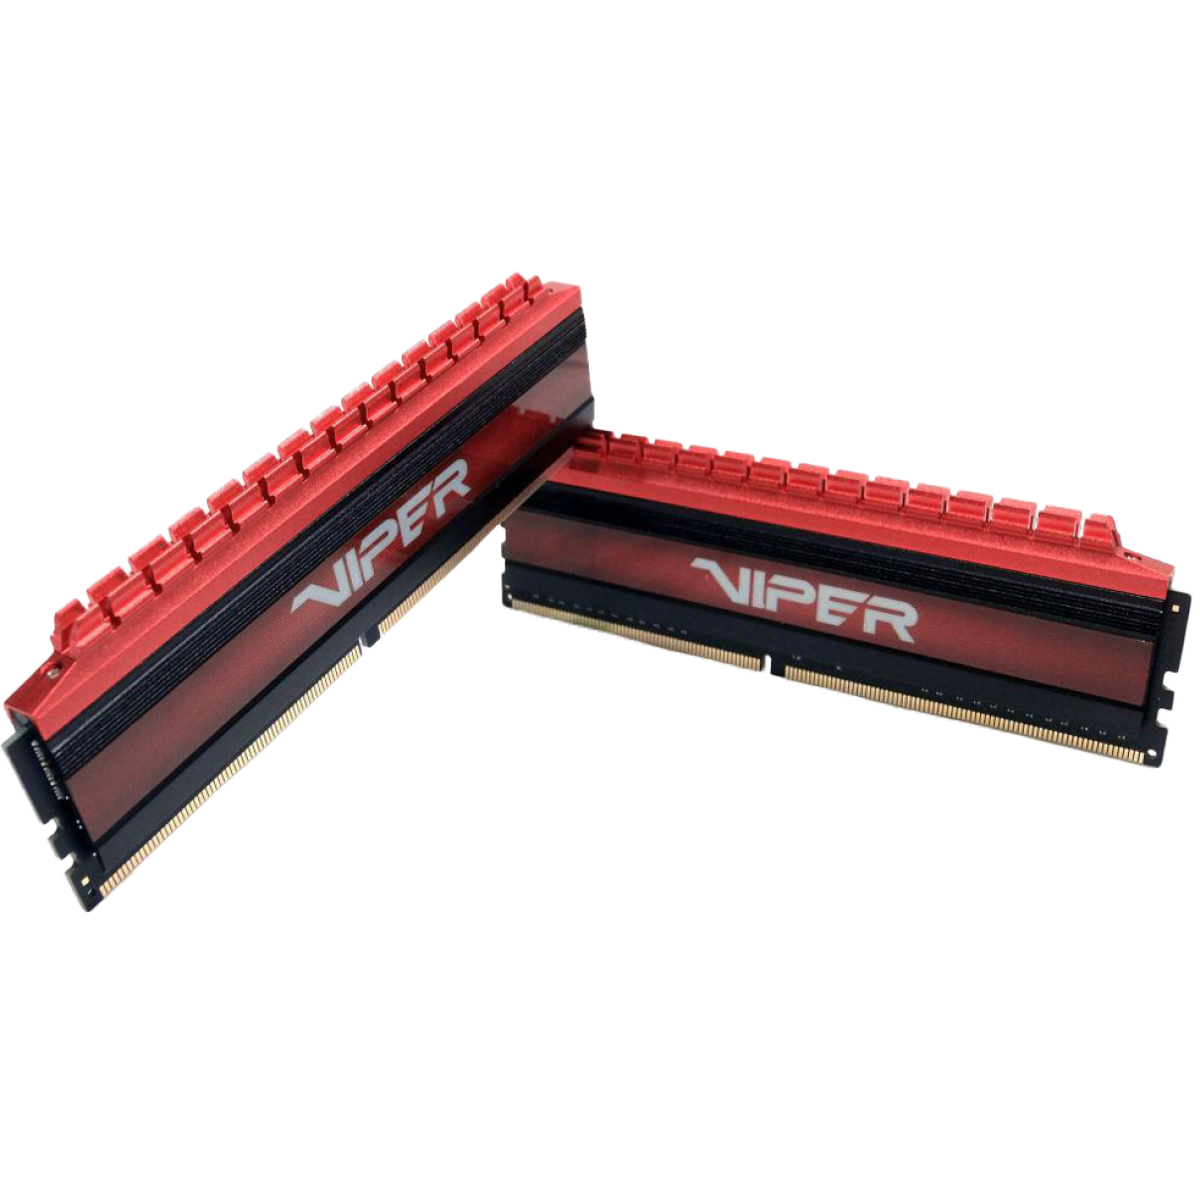 Memória DDR4 Patriot Viper 4, 16GB (2x8GB) 3000MHz, Red, PV416G300C6K